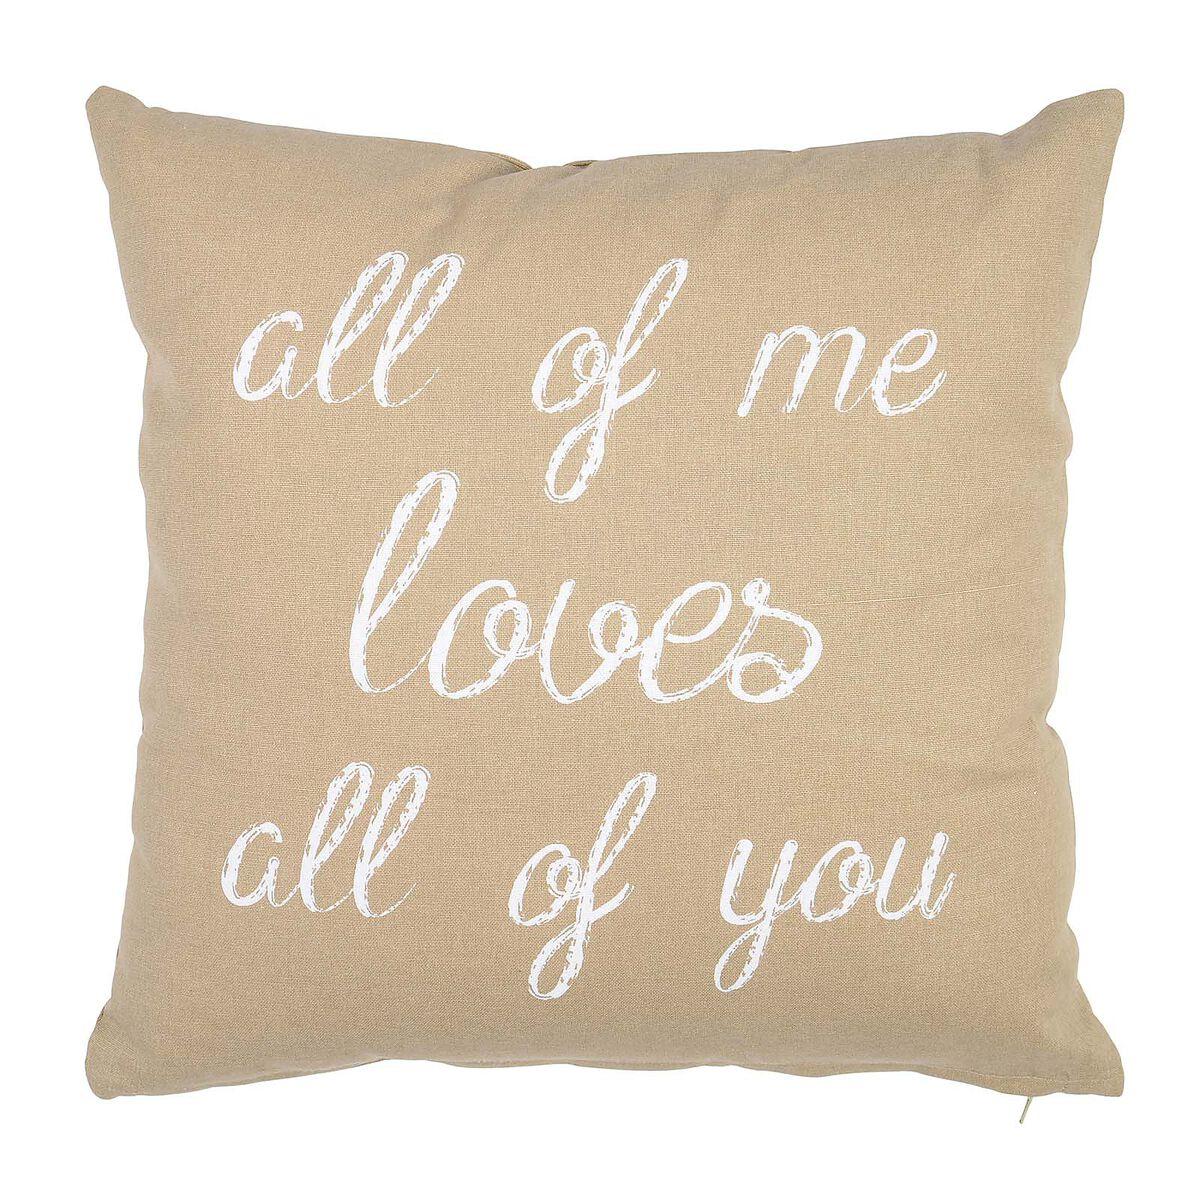 kissen all of you schlamm ca b 45 x l 45 cm kissenh lle. Black Bedroom Furniture Sets. Home Design Ideas